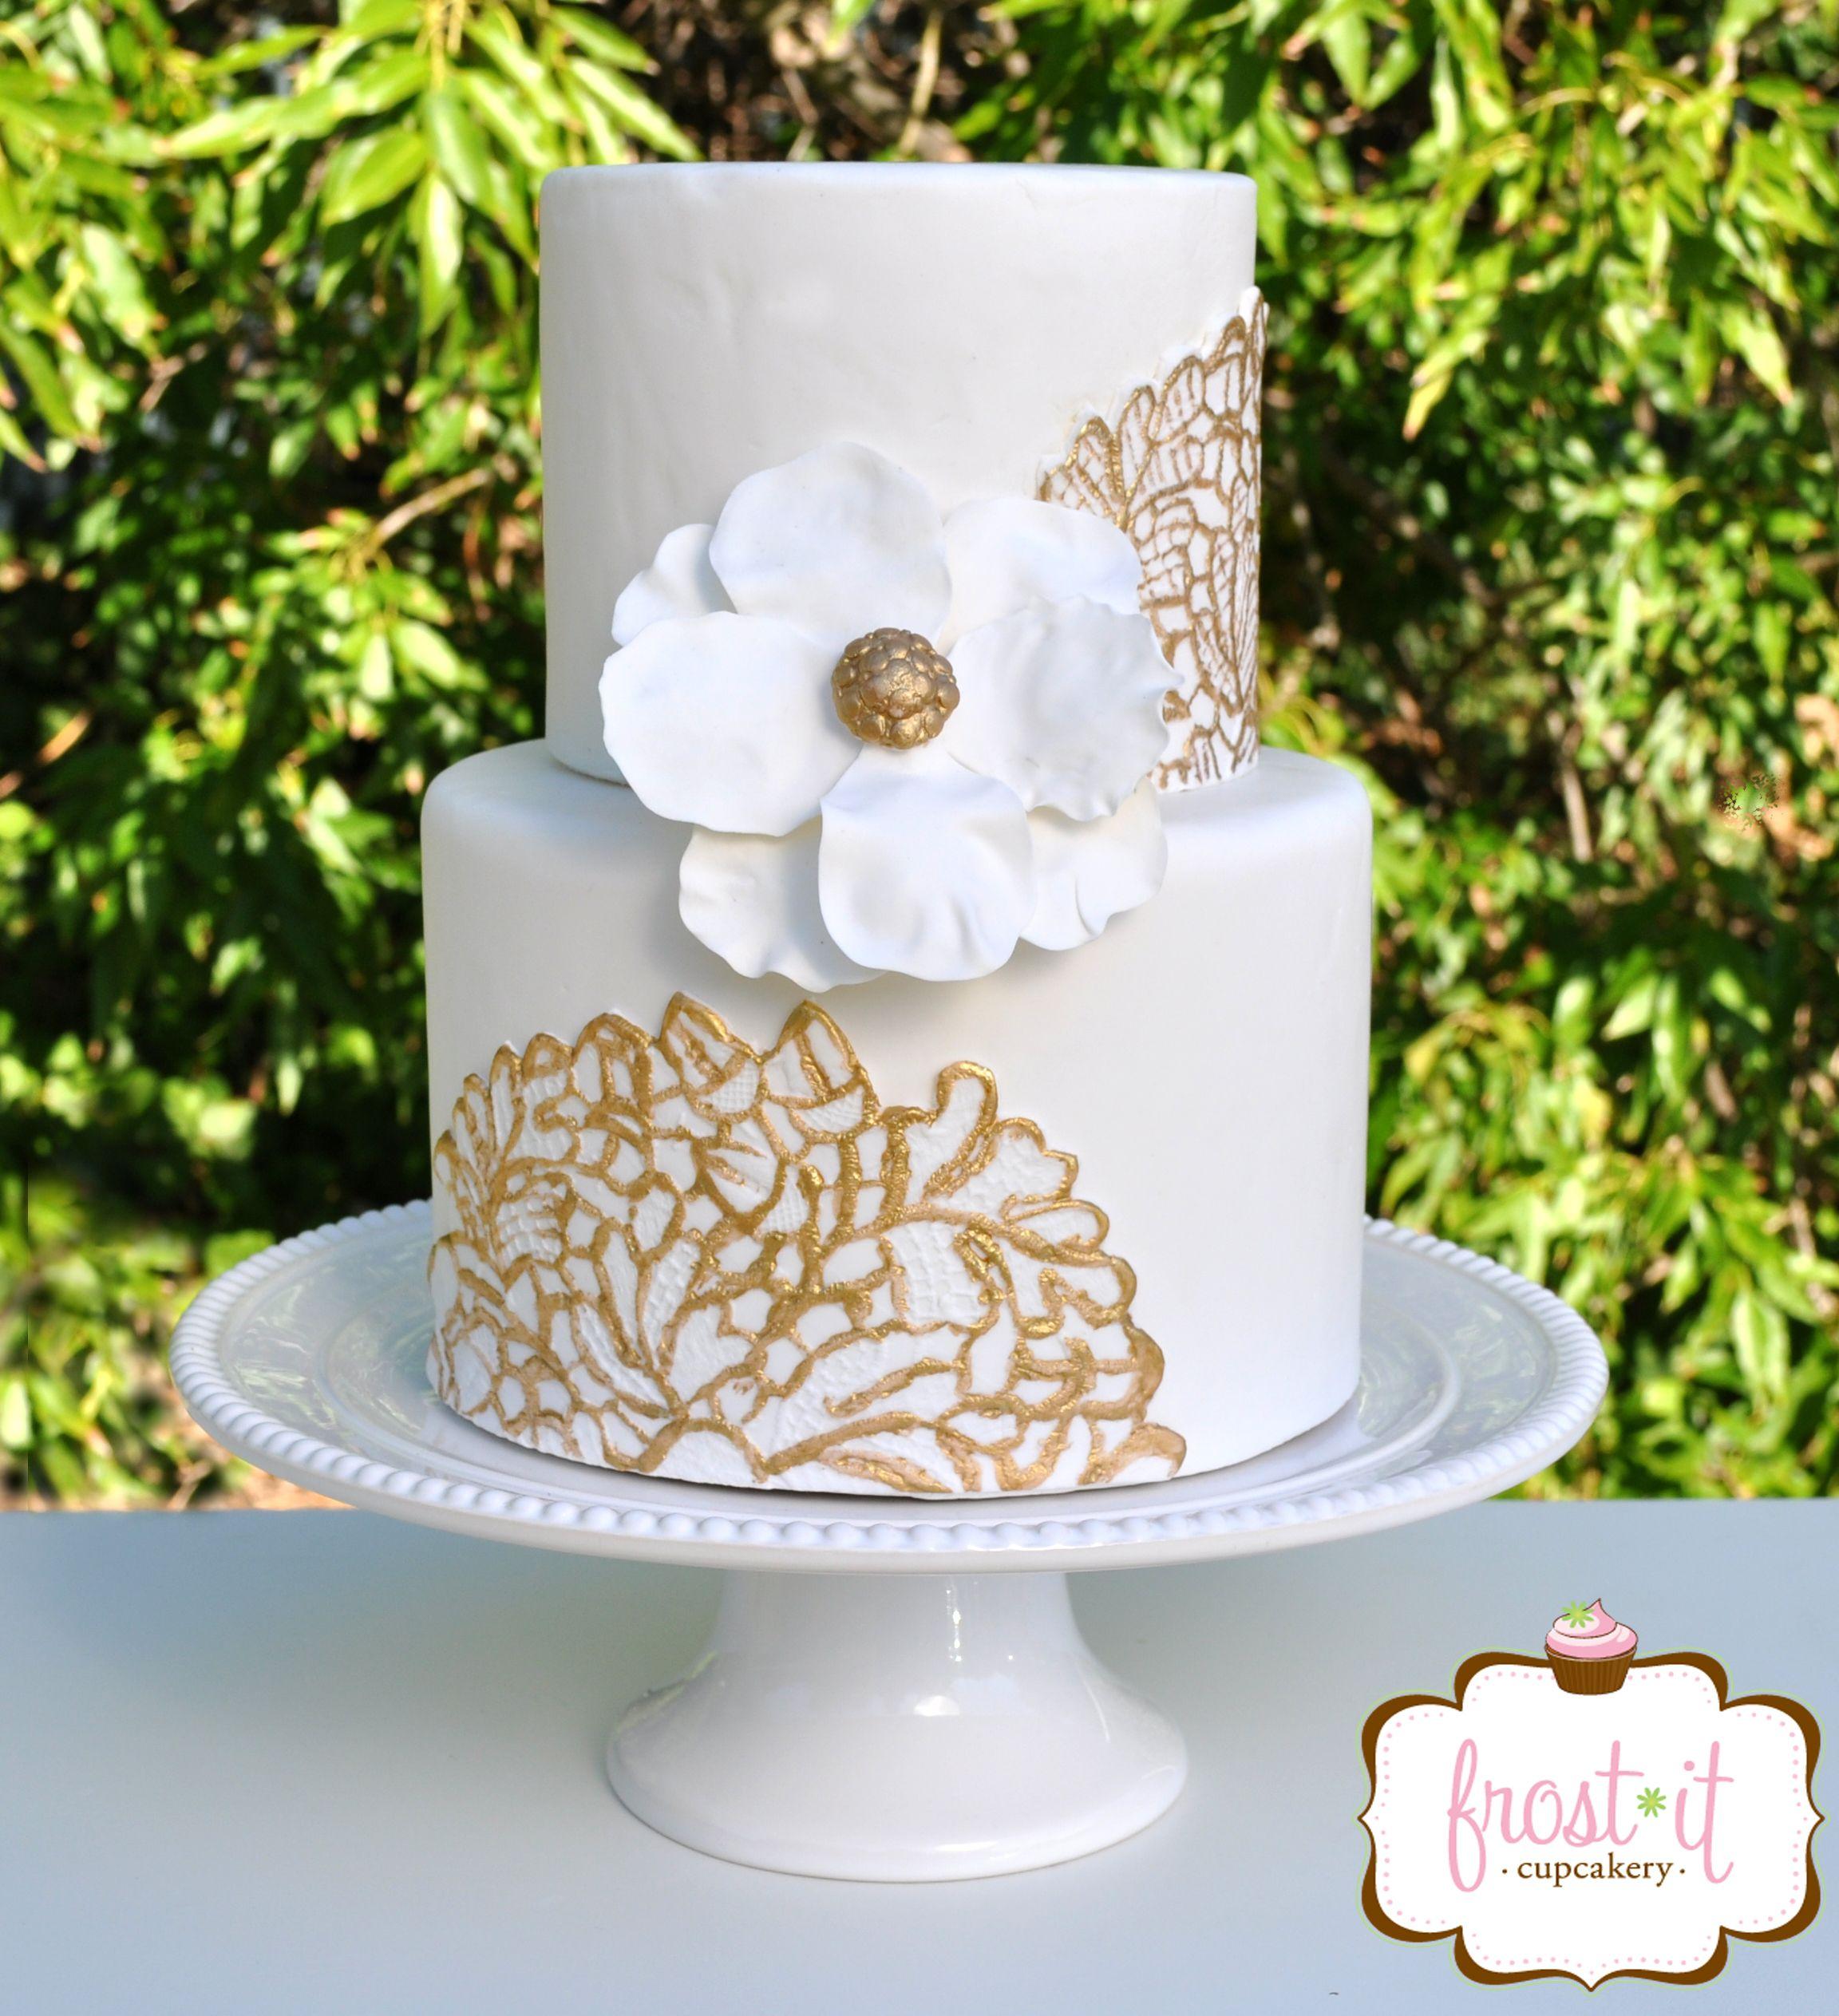 Cake With Fondant Lace : White and gold fondant lace wedding cake Fondant cake Lace ...